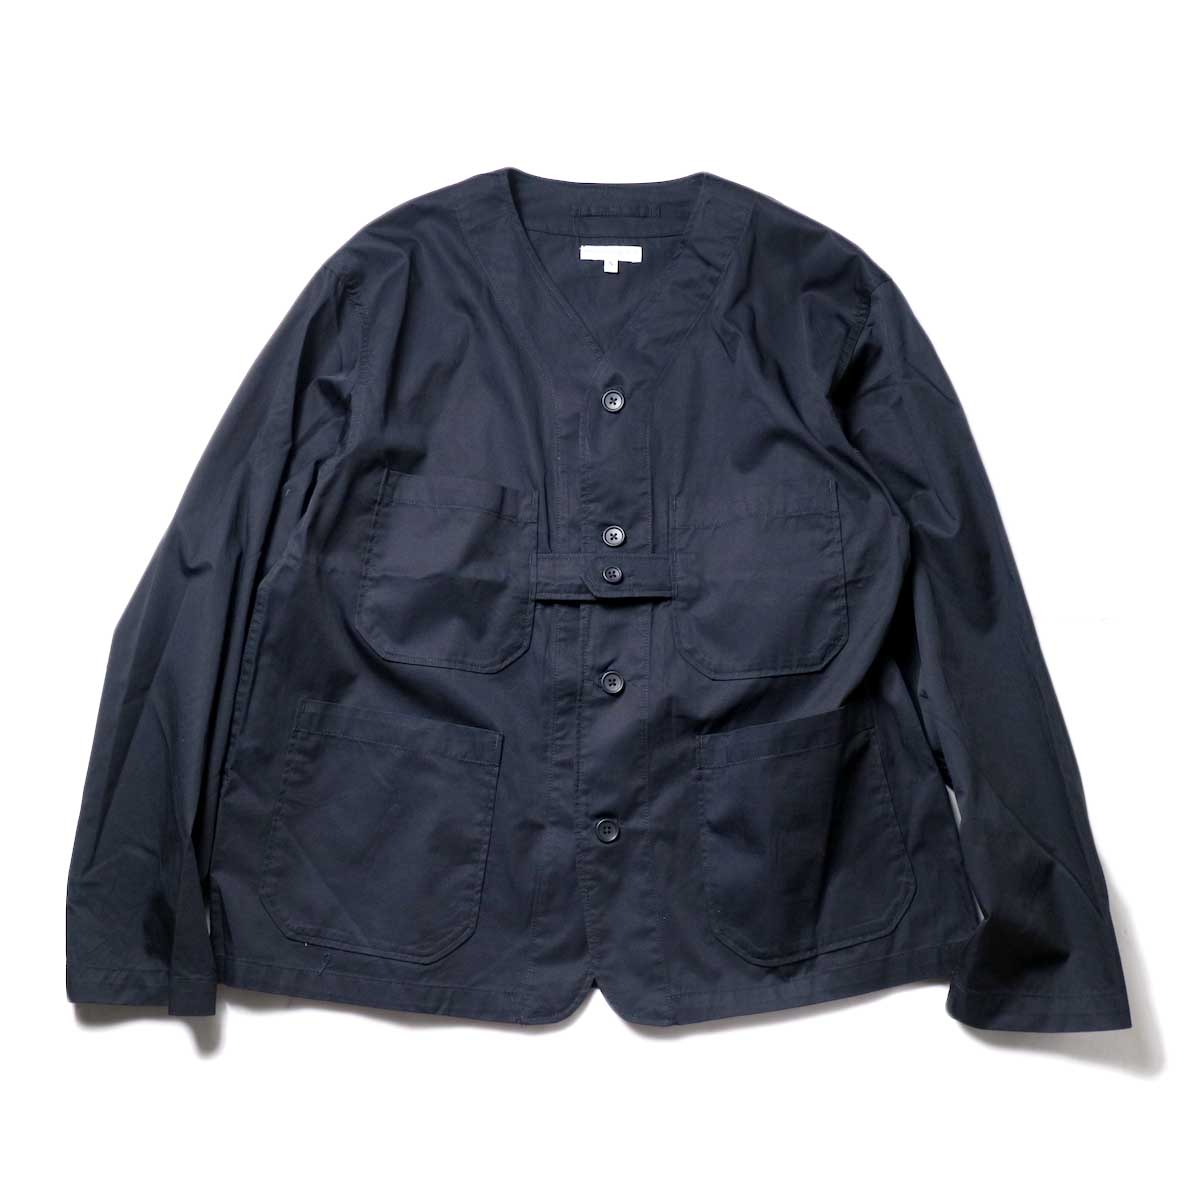 Engineered Garments / Cardigan Jacket -High Count Twill (Black)正面